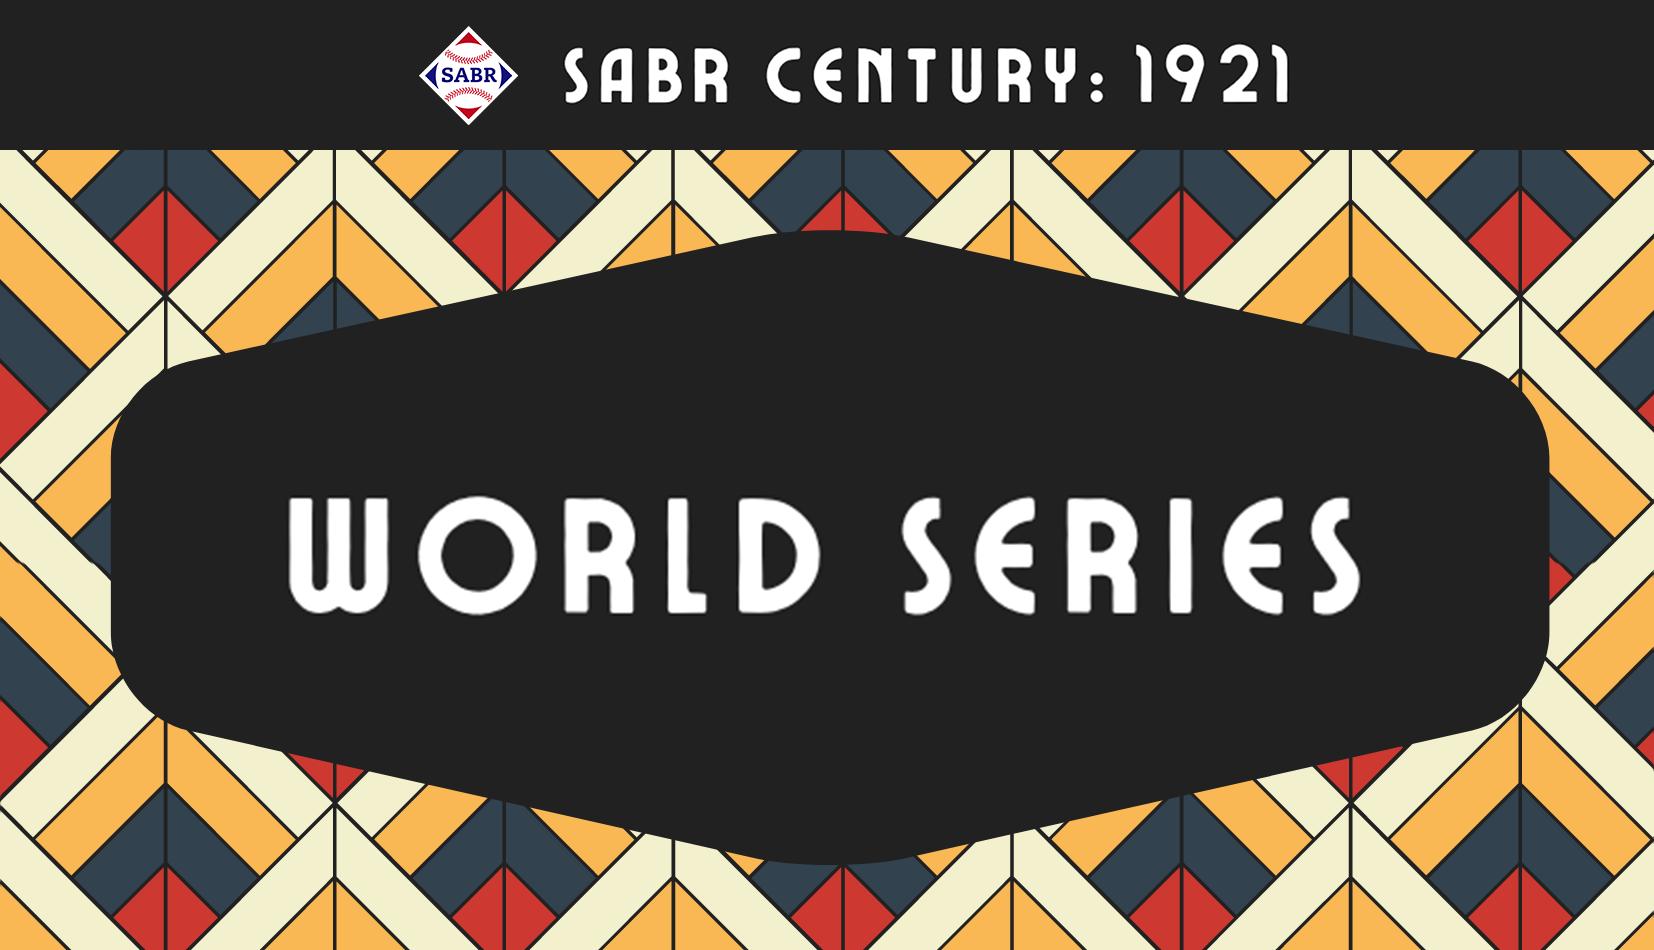 SABR Century: 1921 All-NYC World Series